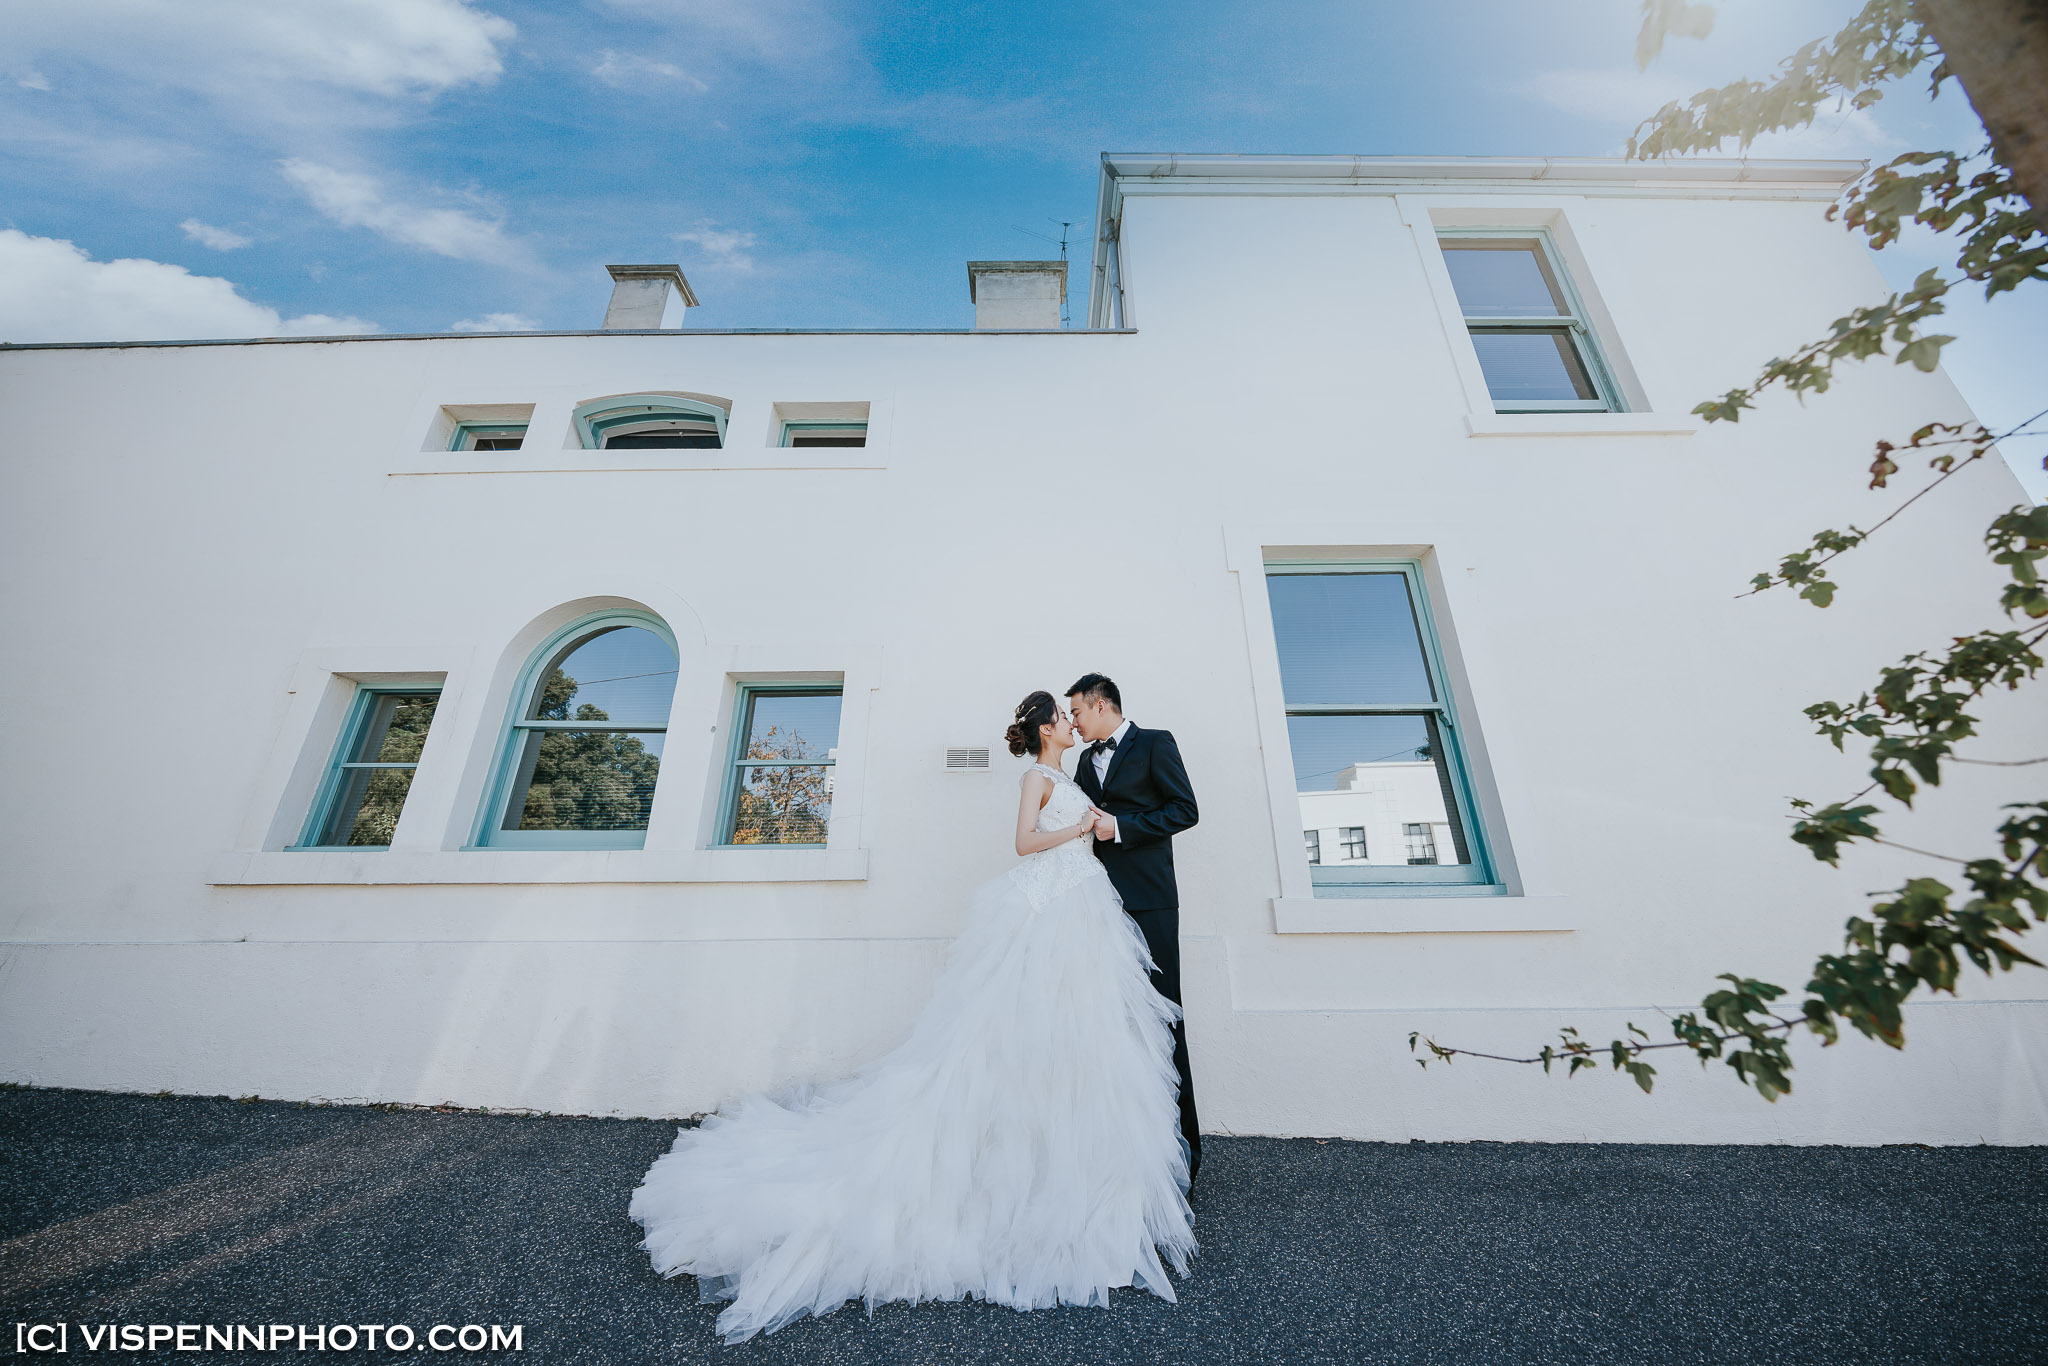 PRE WEDDING Photography Melbourne VISPENN 墨尔本 婚纱照 结婚照 婚纱摄影 DSC07174